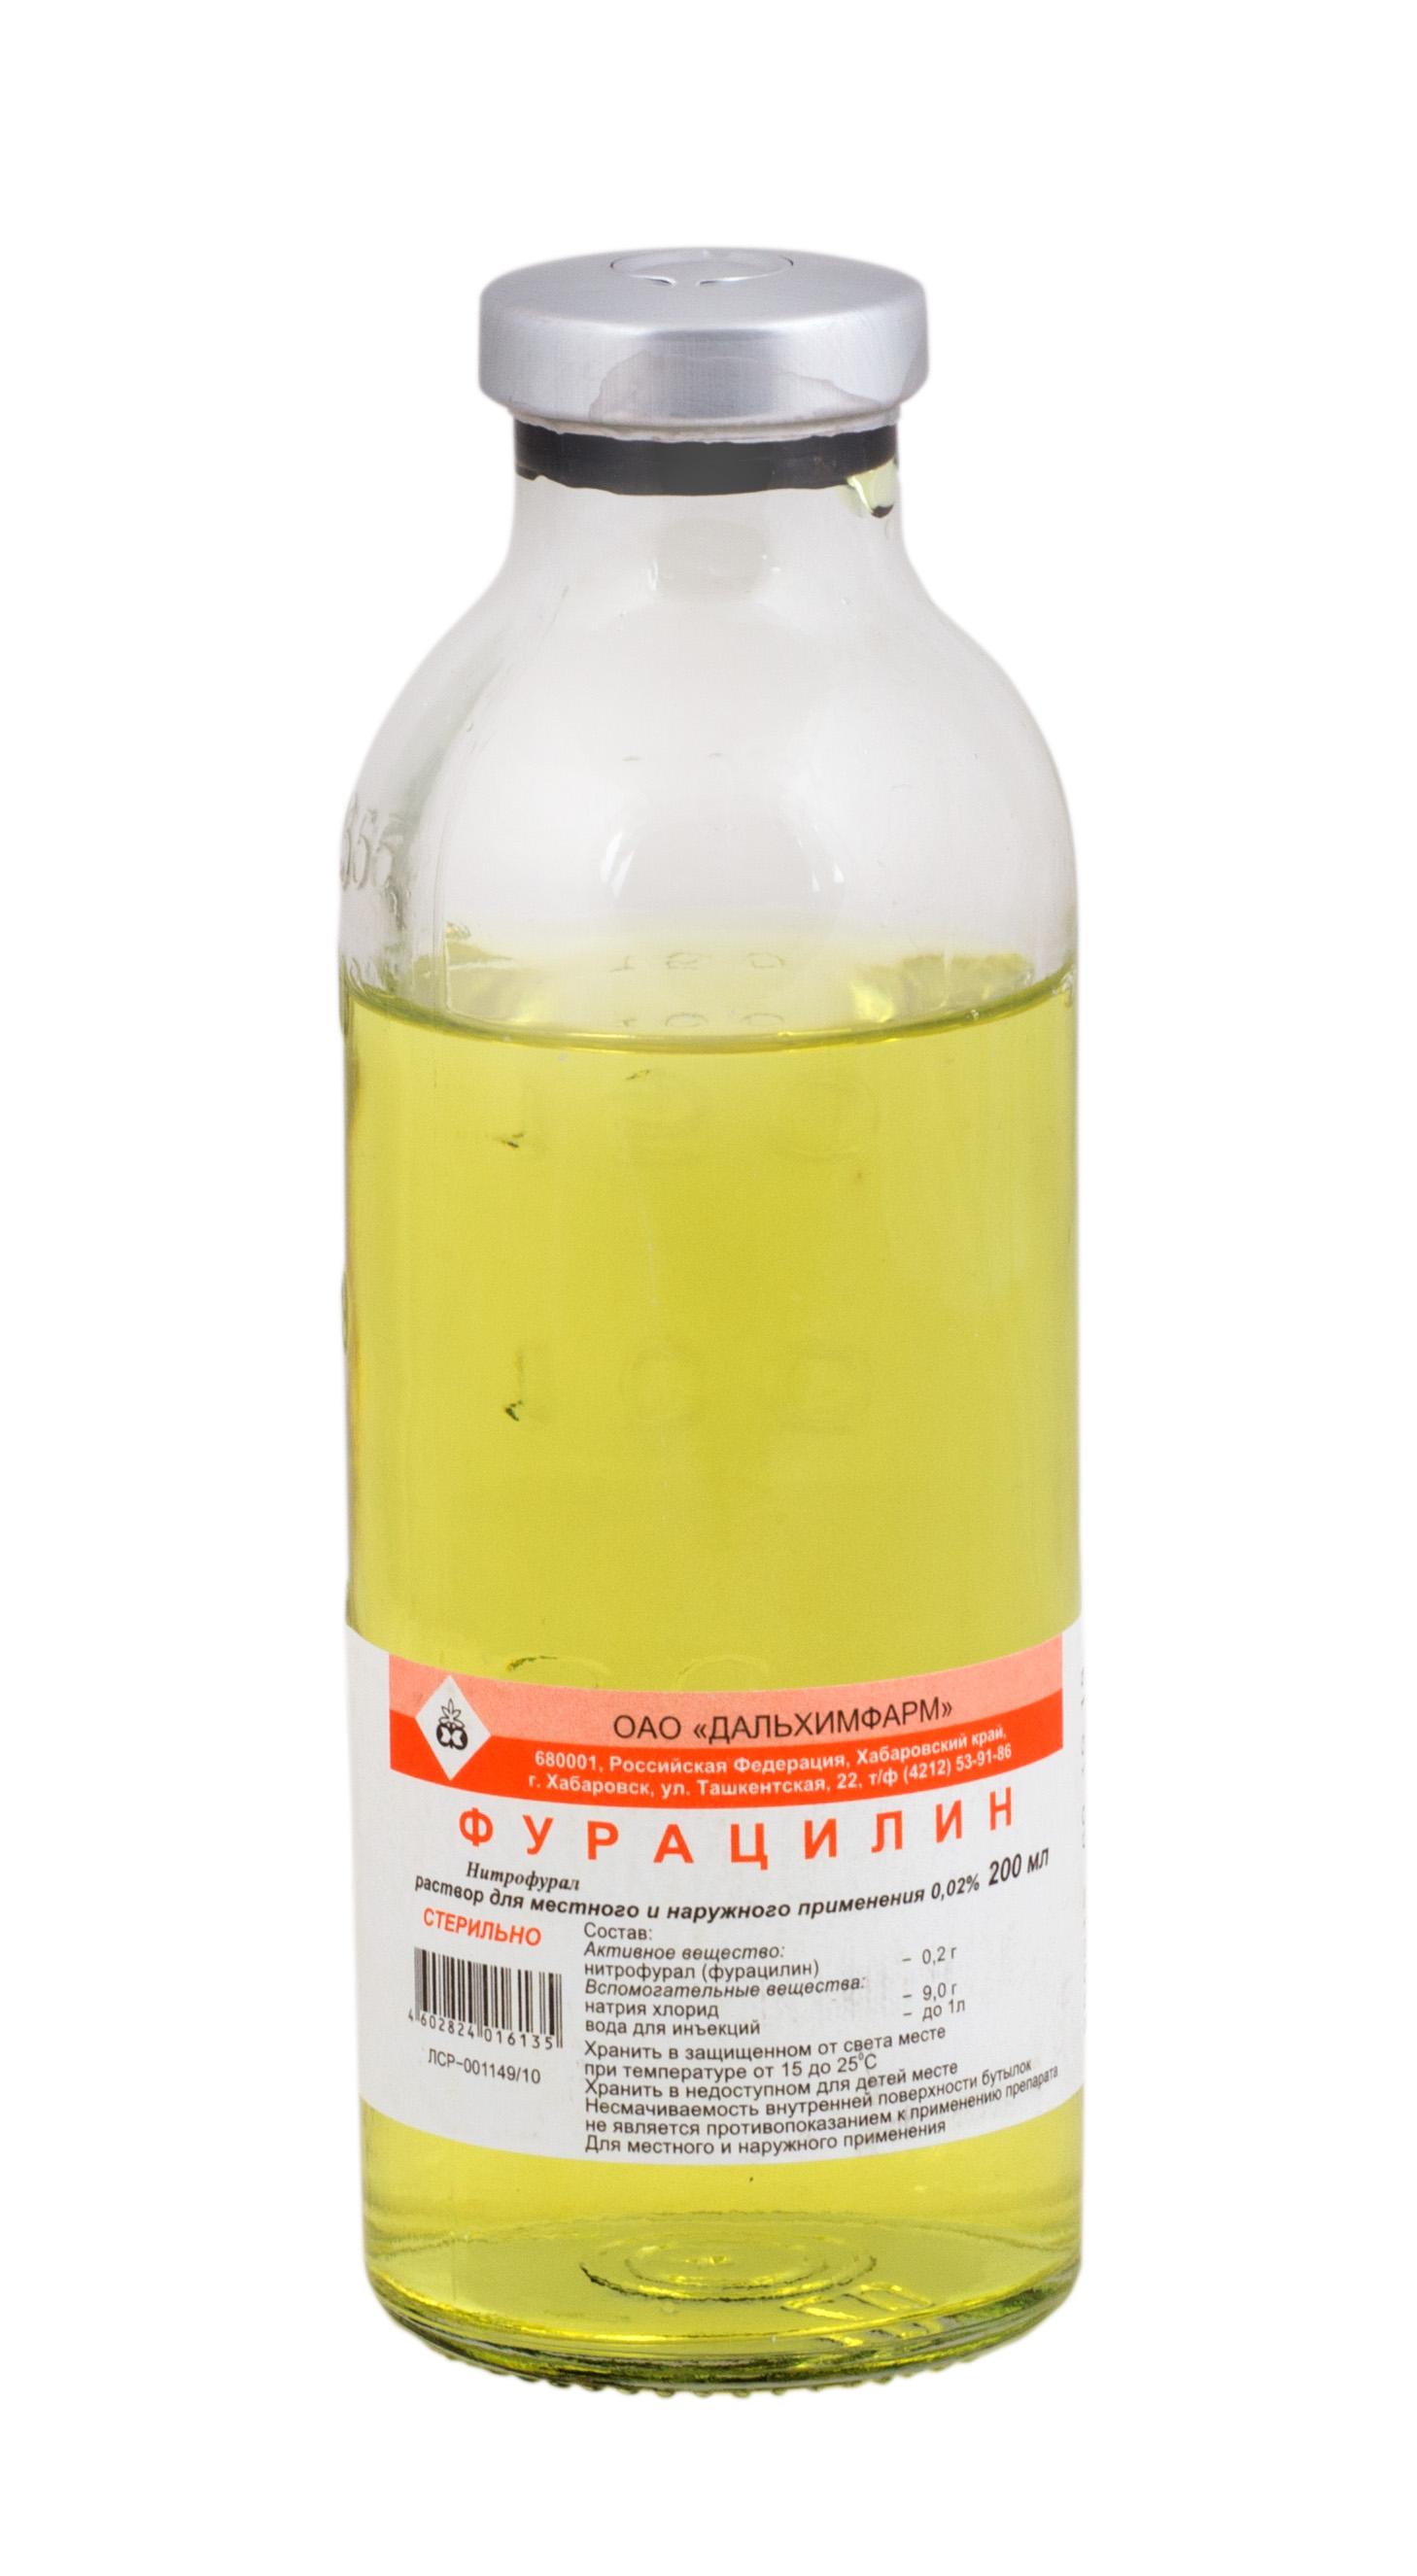 Фурацилин р-р местн и наруж 0,02% 200мл